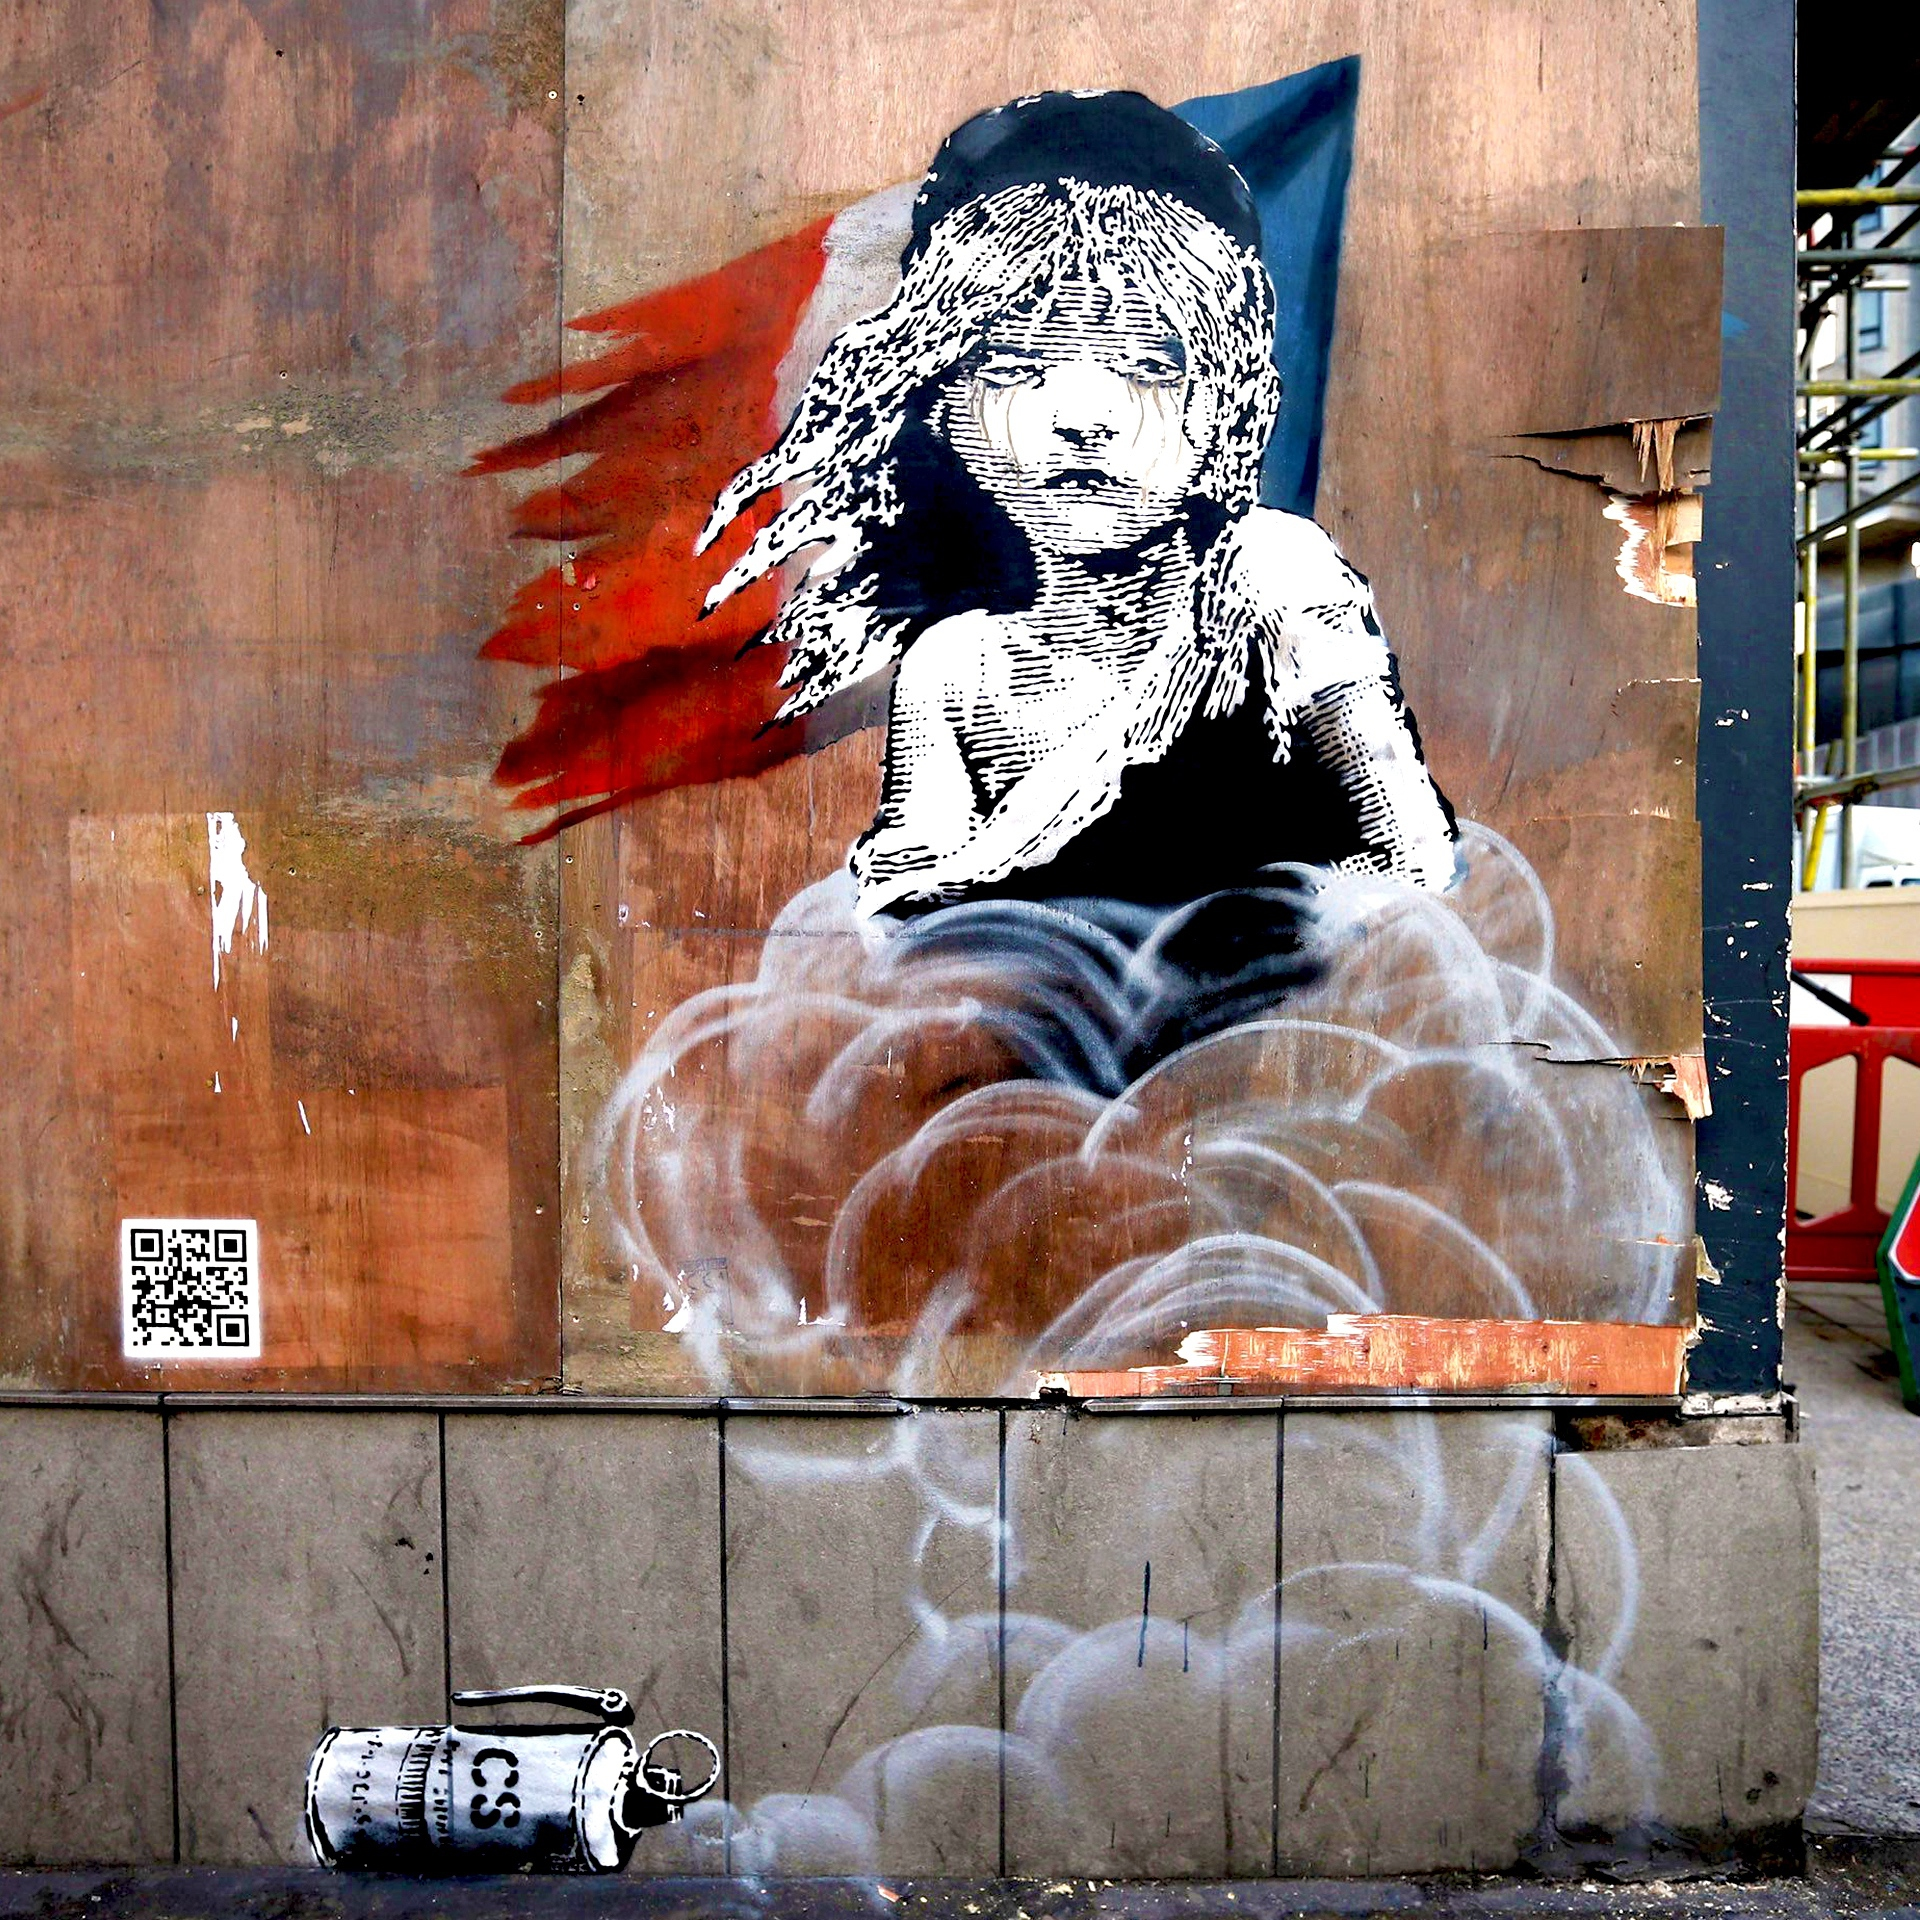 Calais (2016) by Banksy - Pako Campo